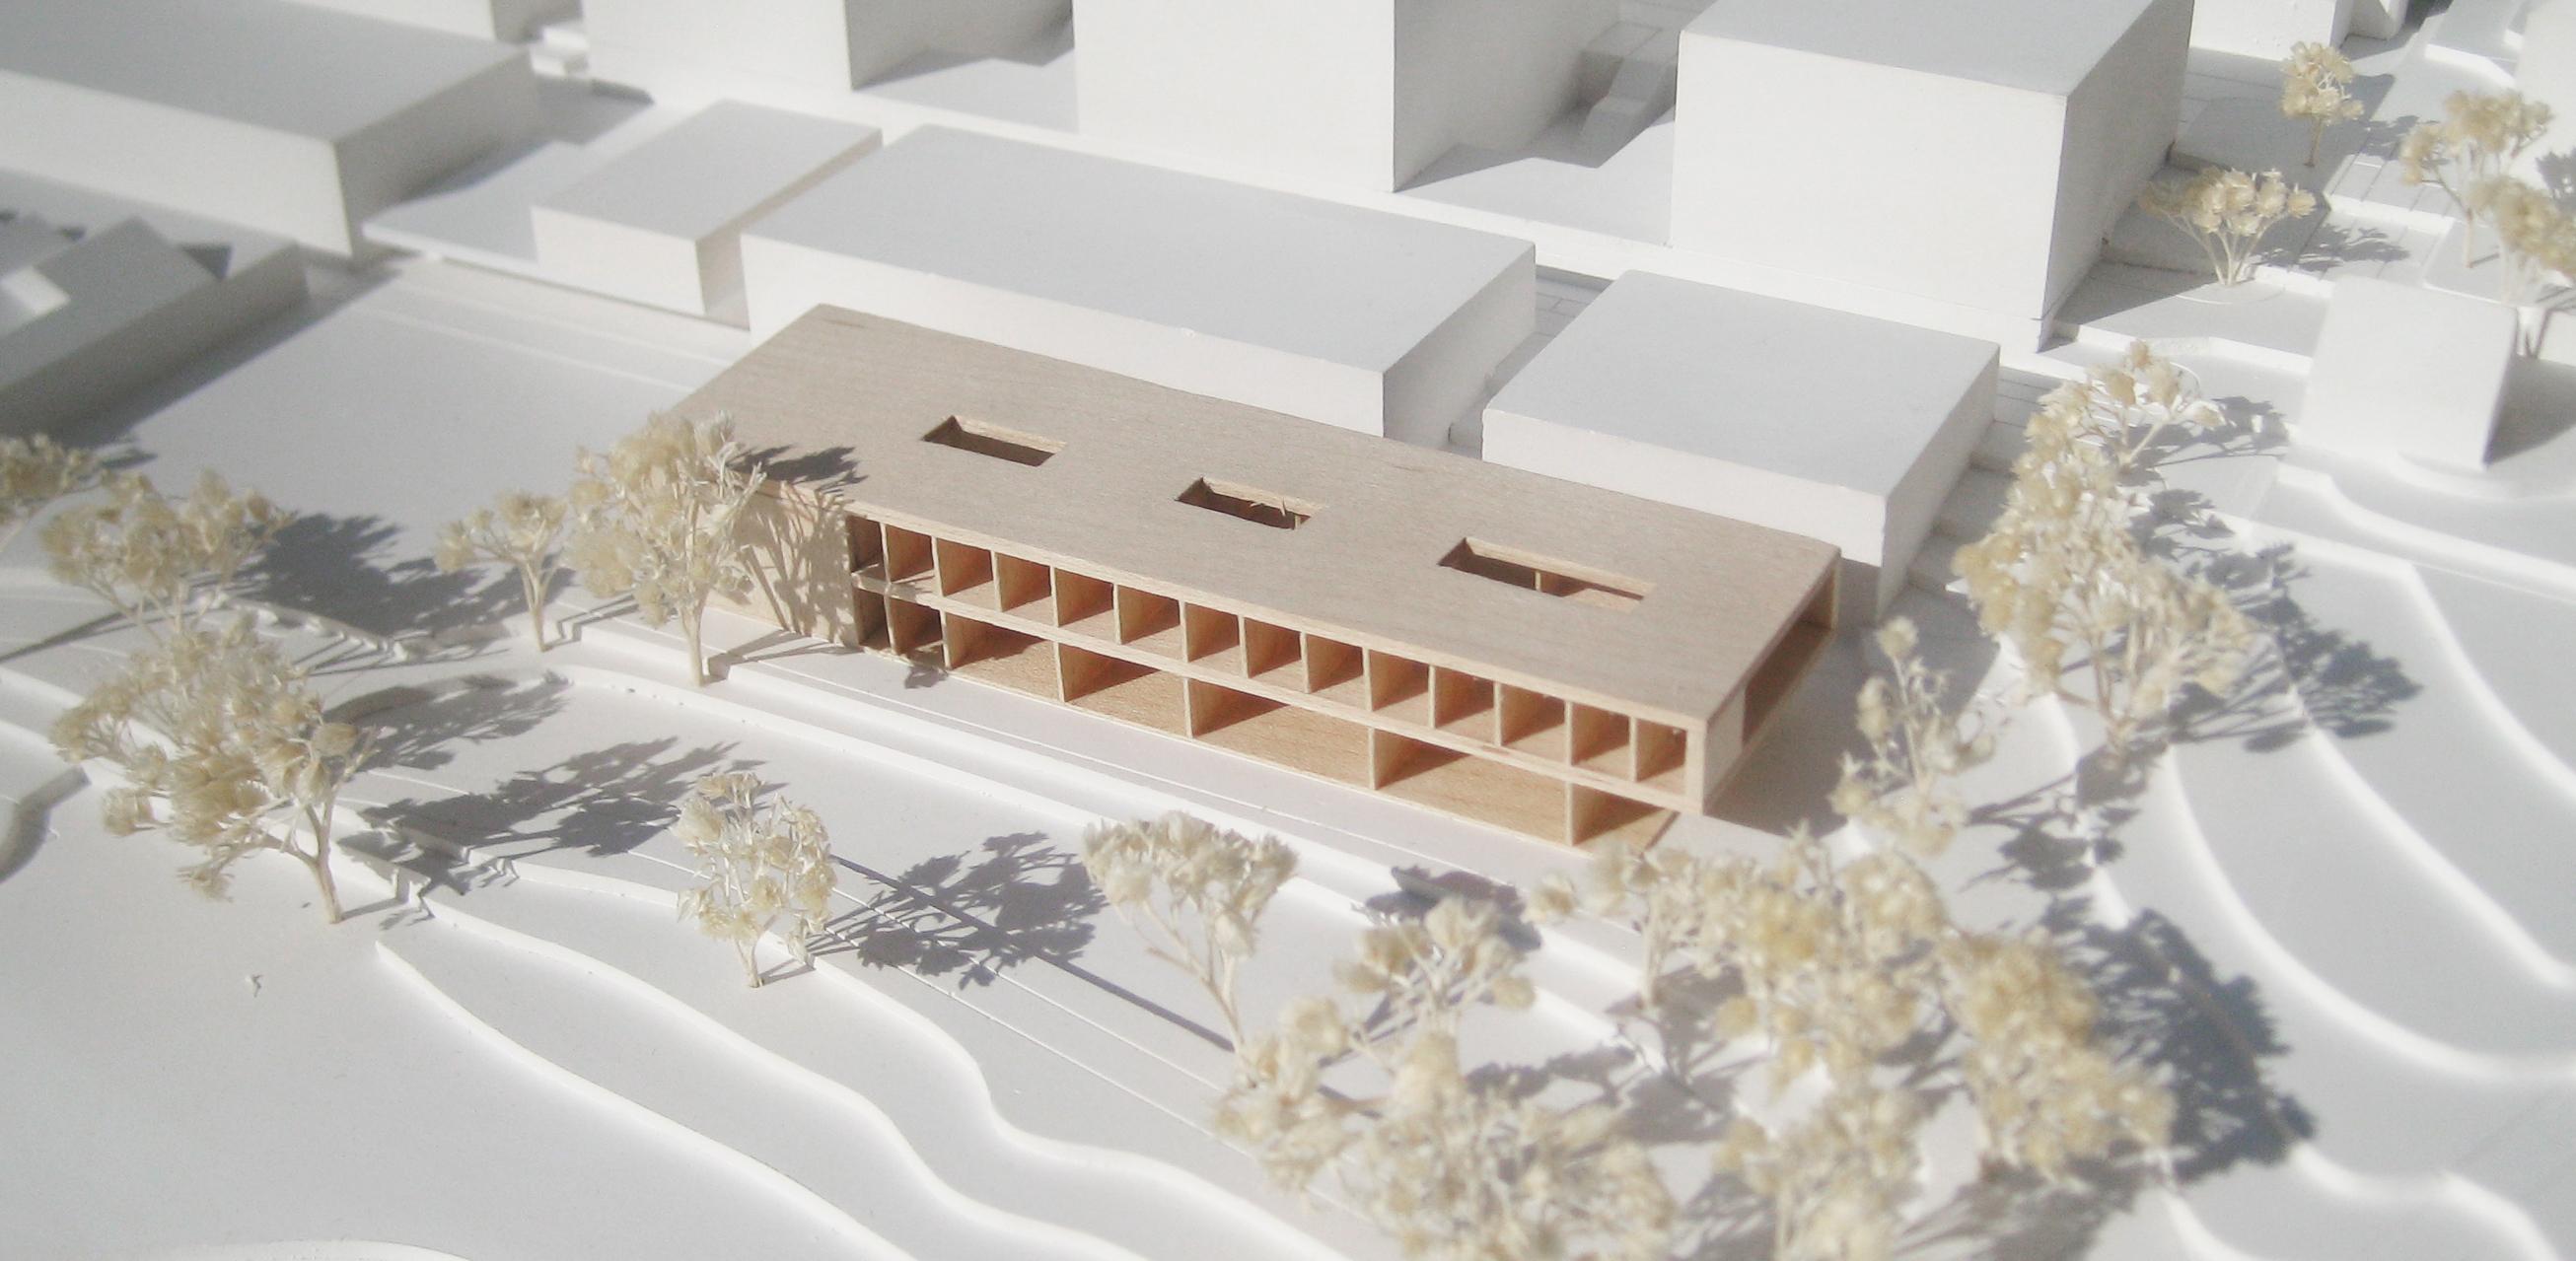 Landesanstalt bienenkunde uni hohenheim kohler grohe - Kohler grohe architekten ...